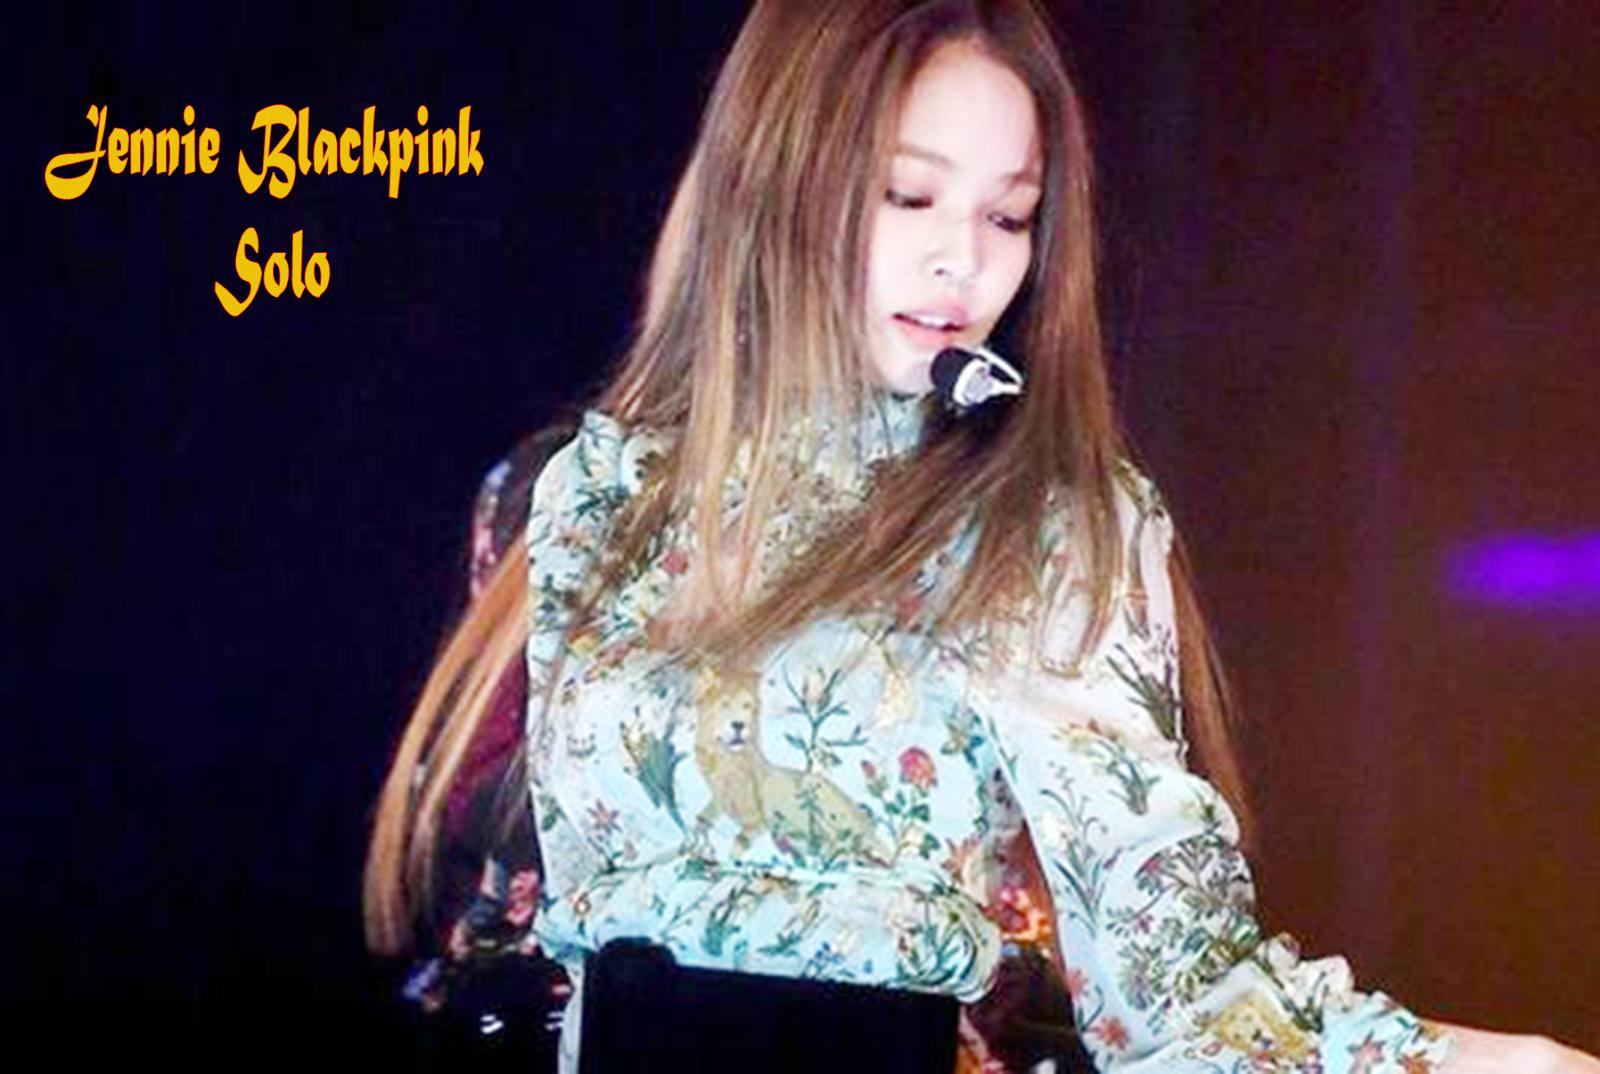 Jennie blackpink solo lirik